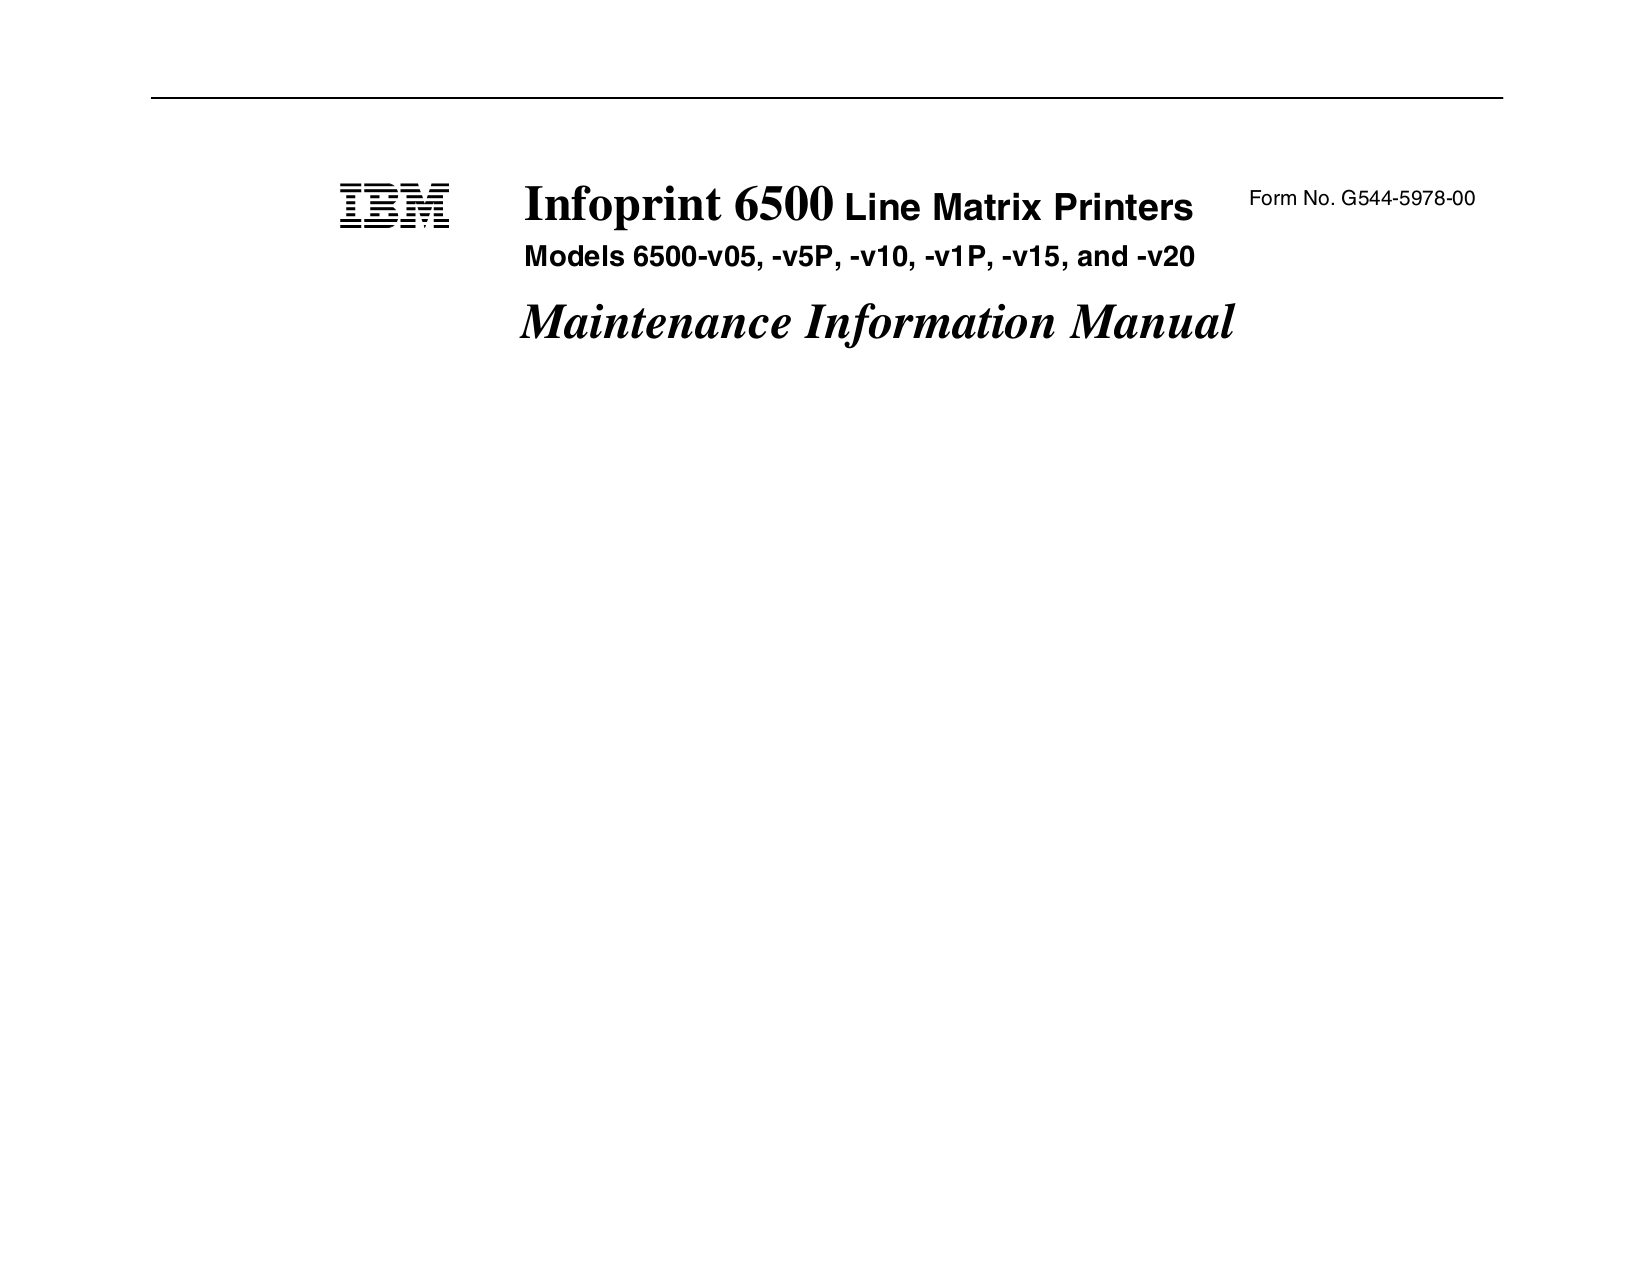 pdf for IBM Printer InfoPrint 6500 manual